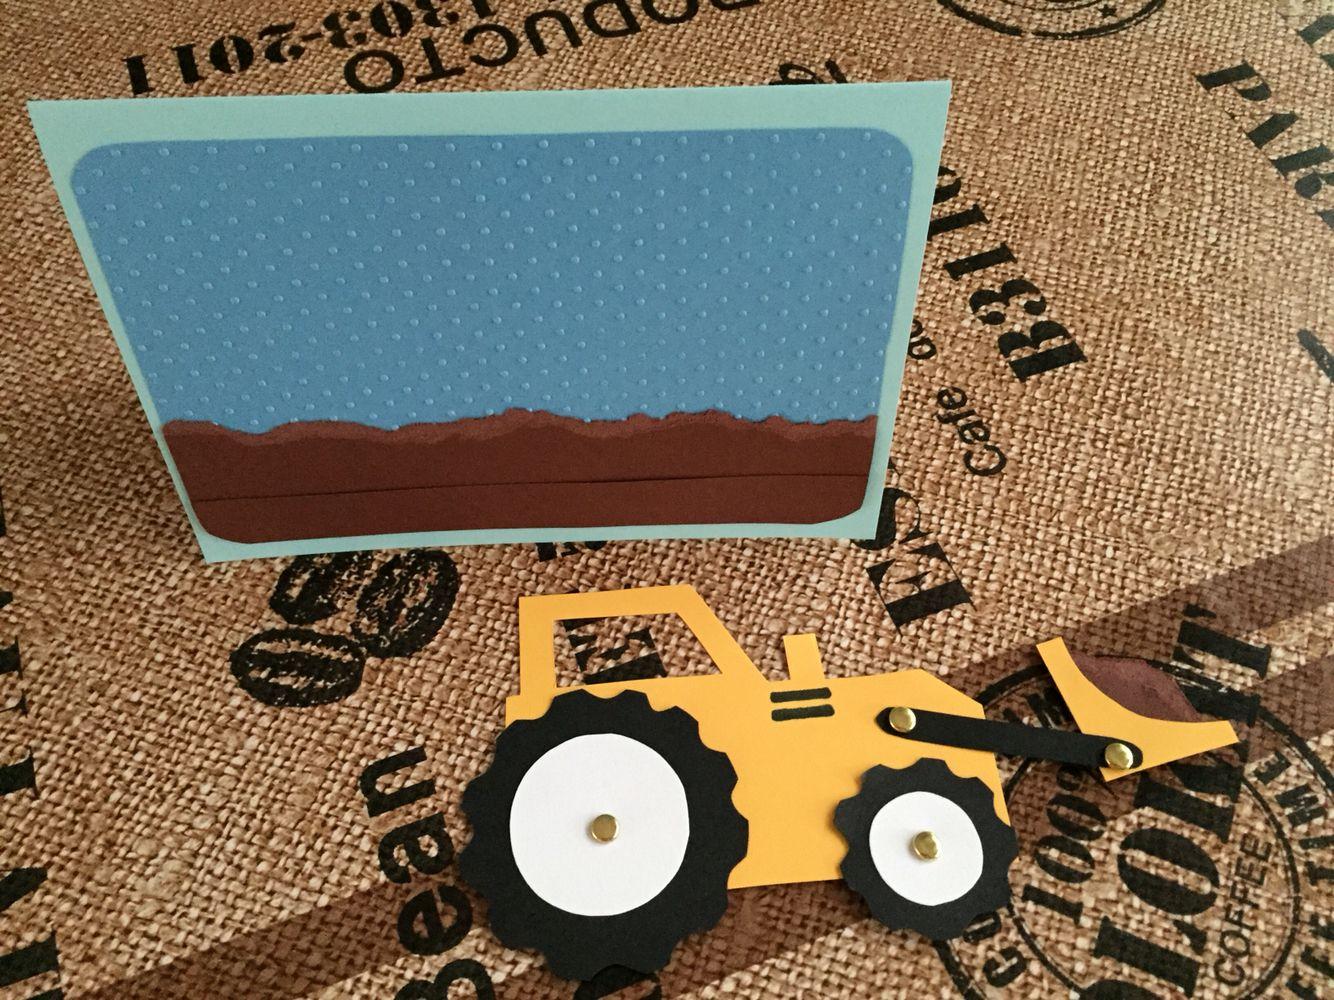 Schön #Bagger #Einladung #Kindergeburtstag: Due To Canu0027t Buy These Invitation  Cards